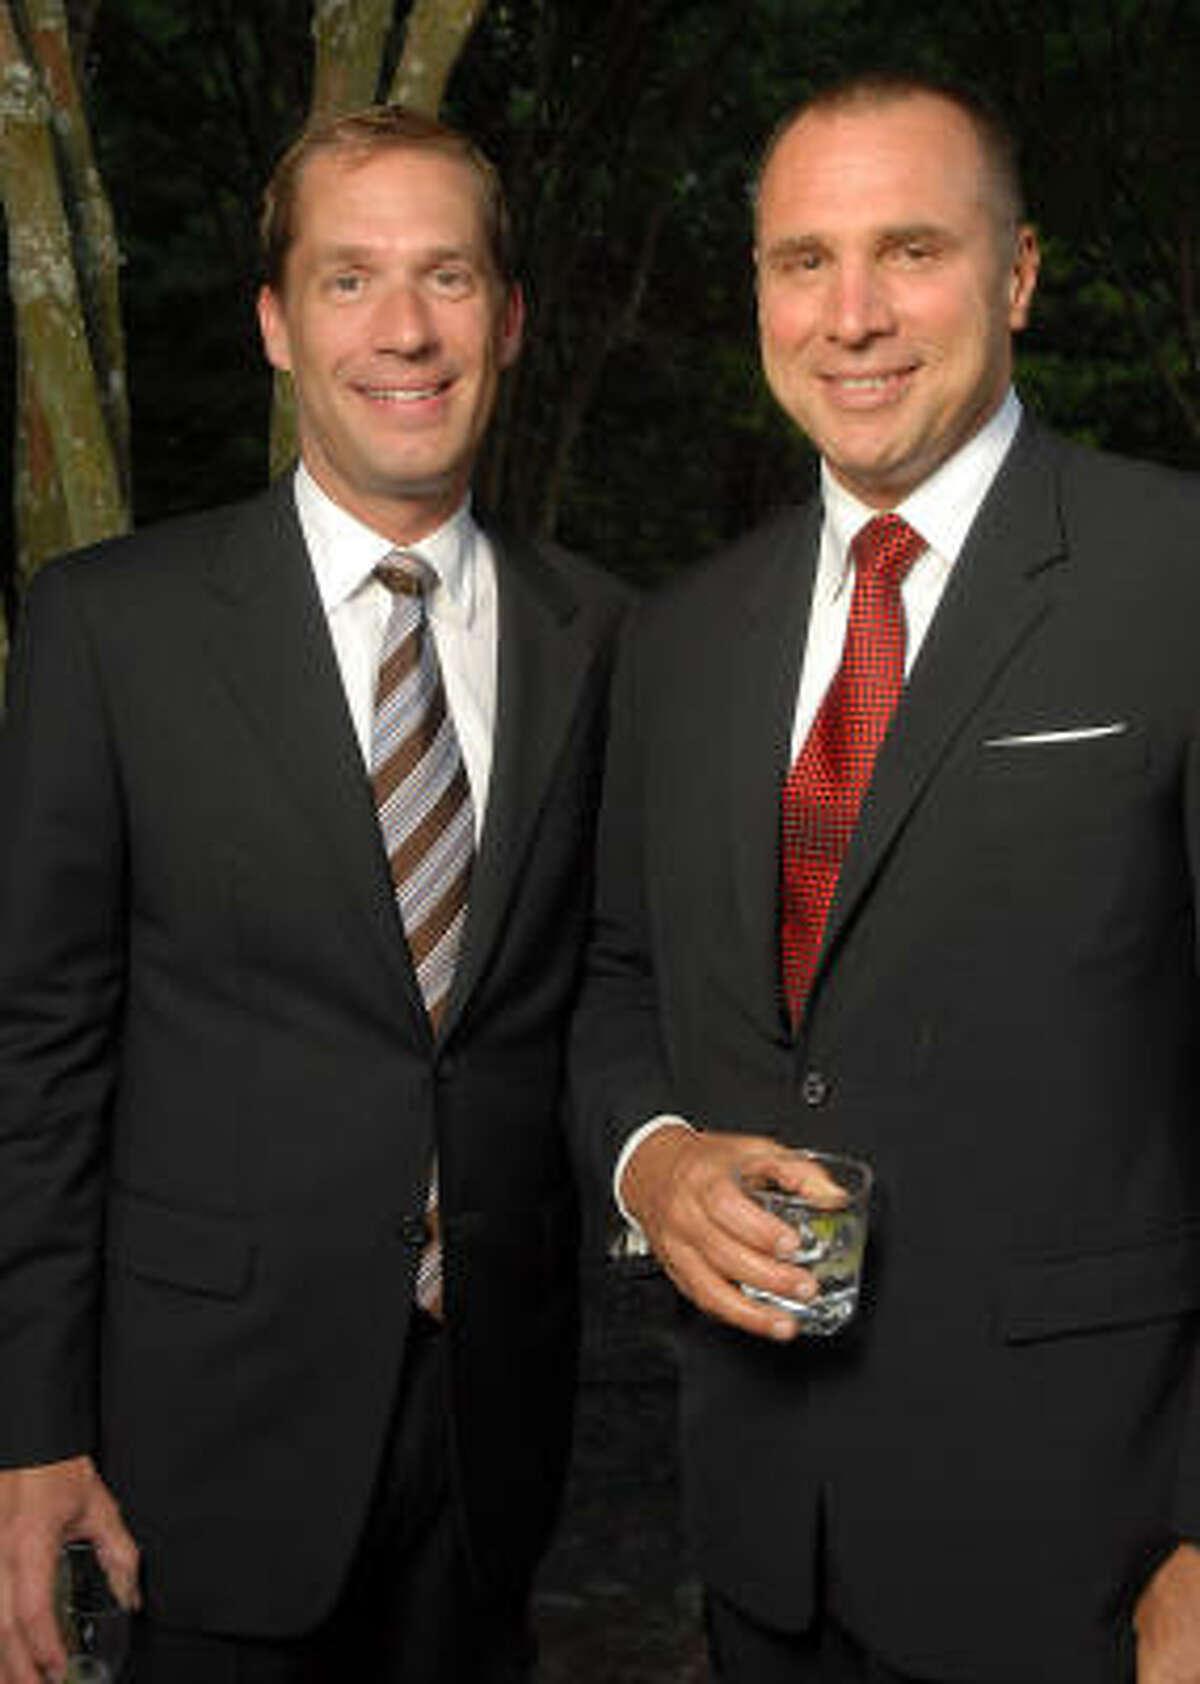 Paul Johnson and William Middleton